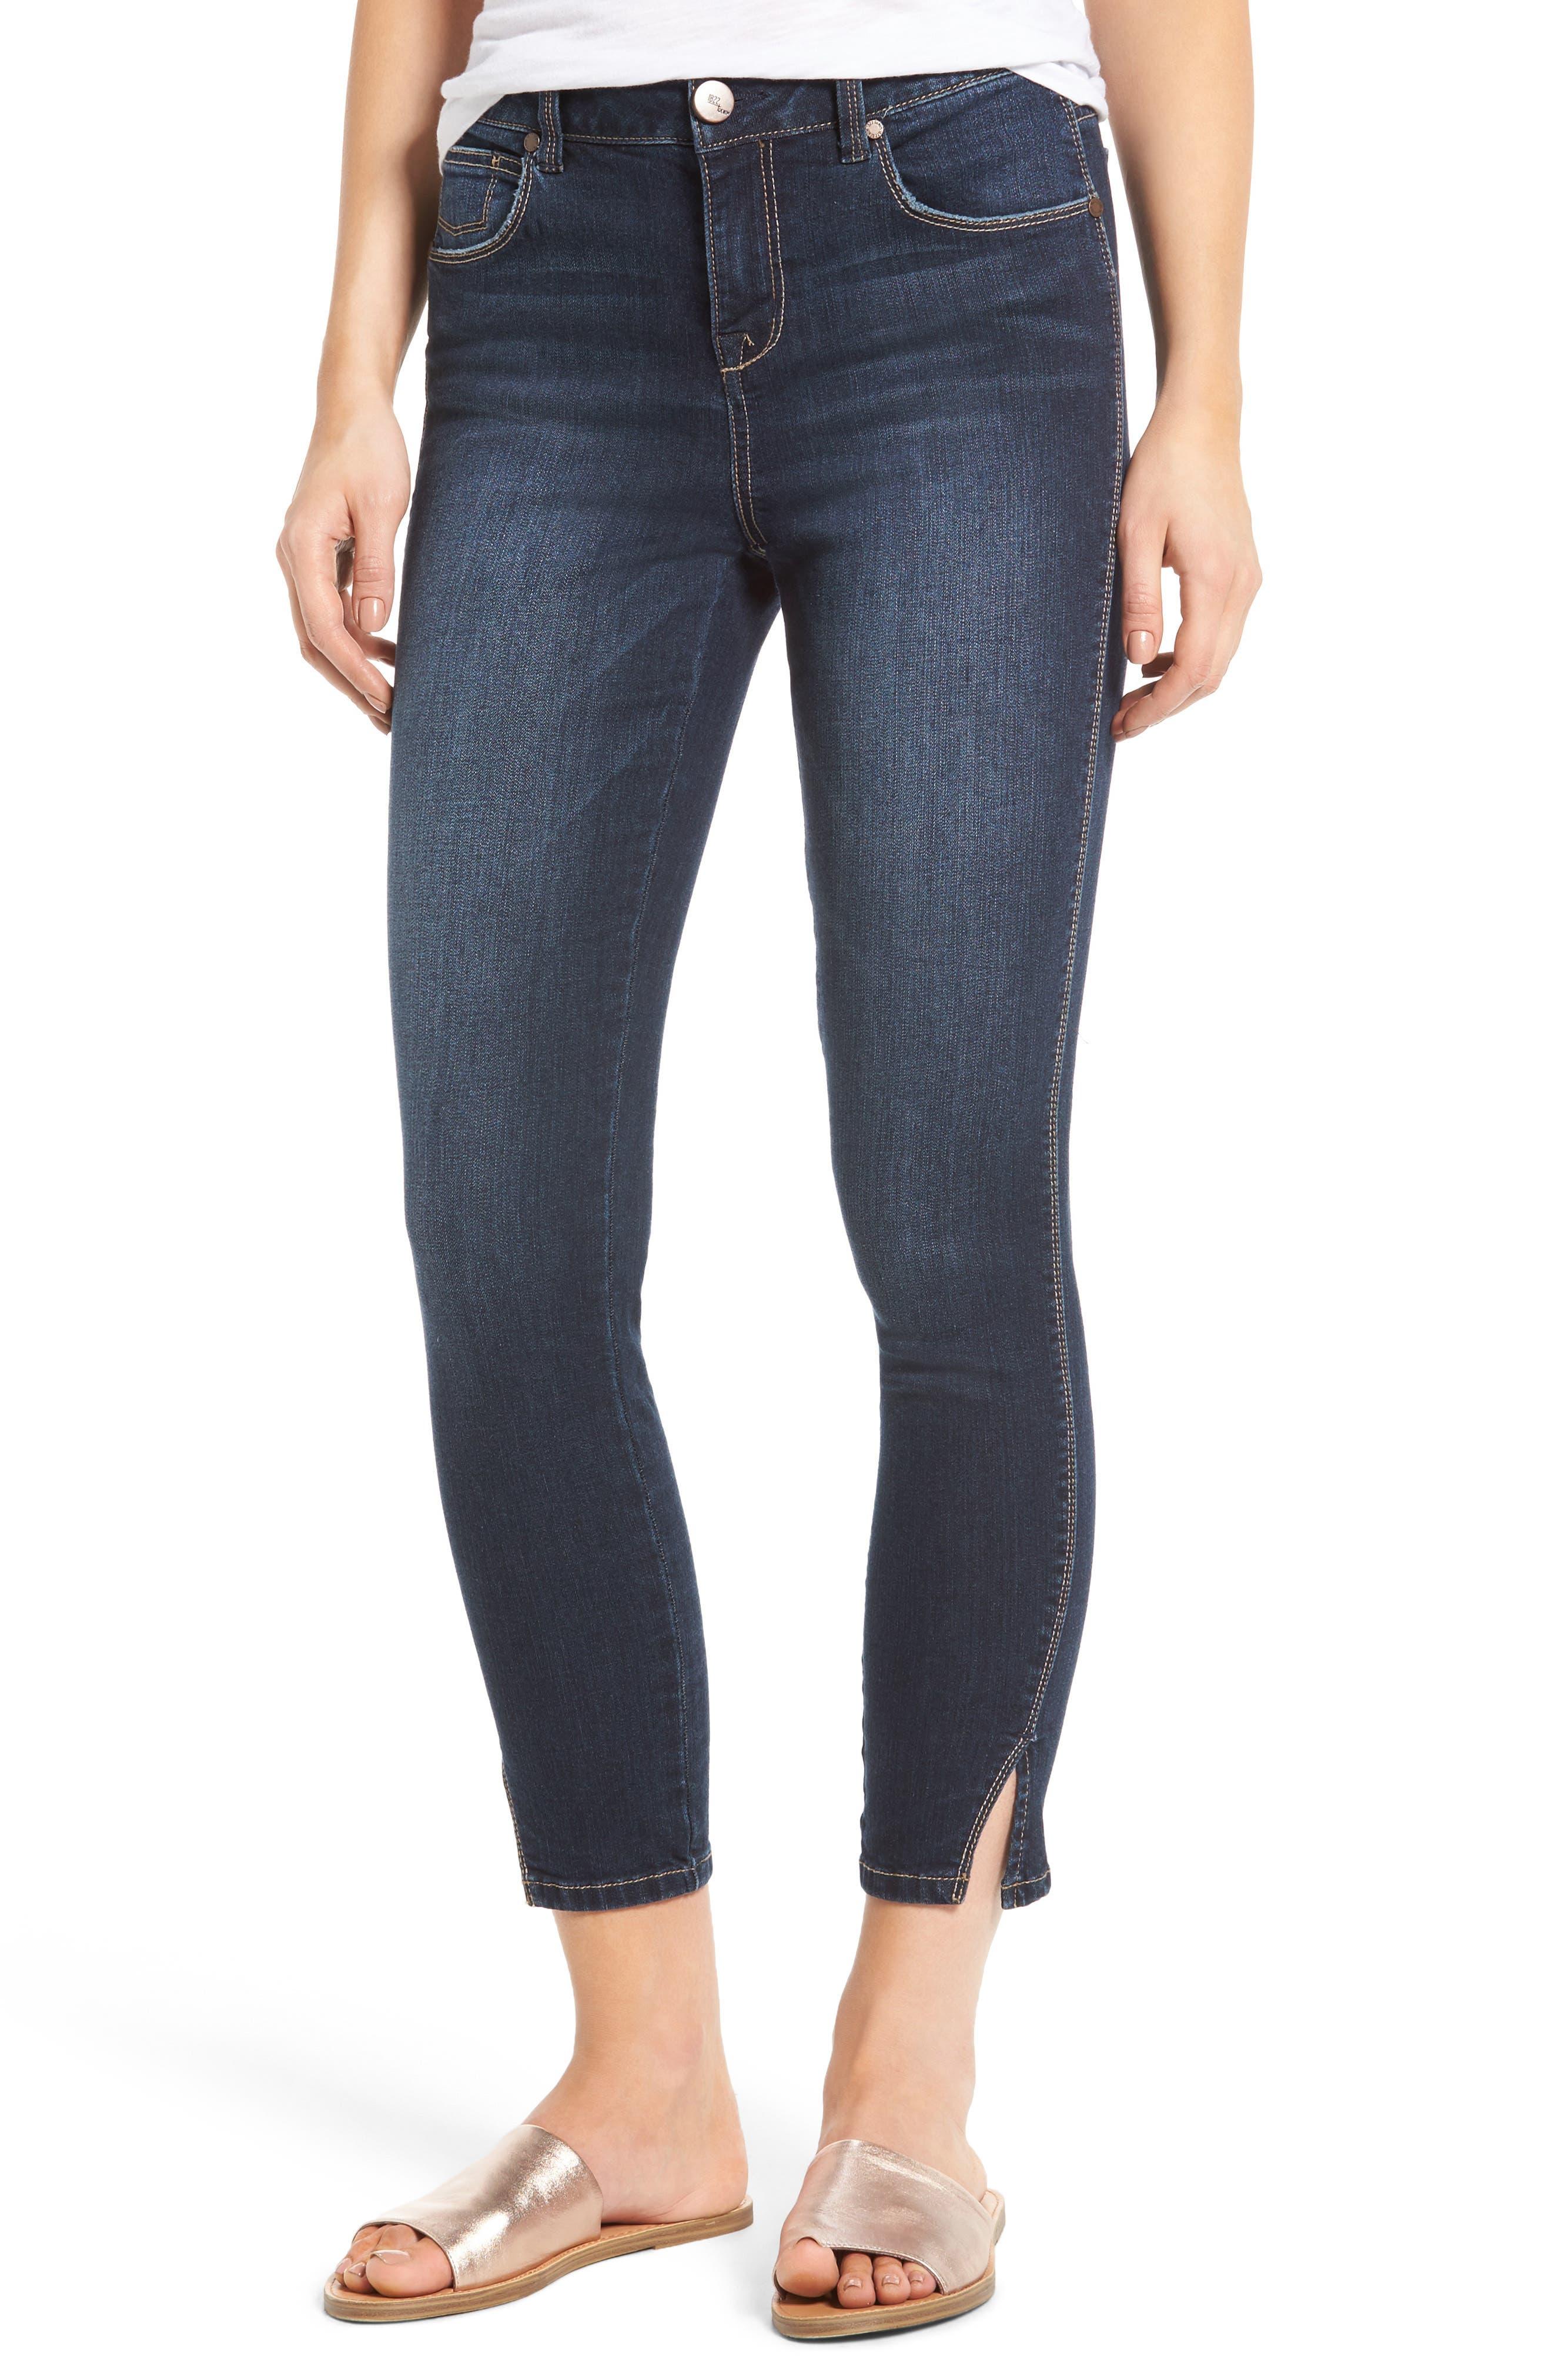 1822 Denim Slit Ankle High Waist Skinny Jeans (Milan)